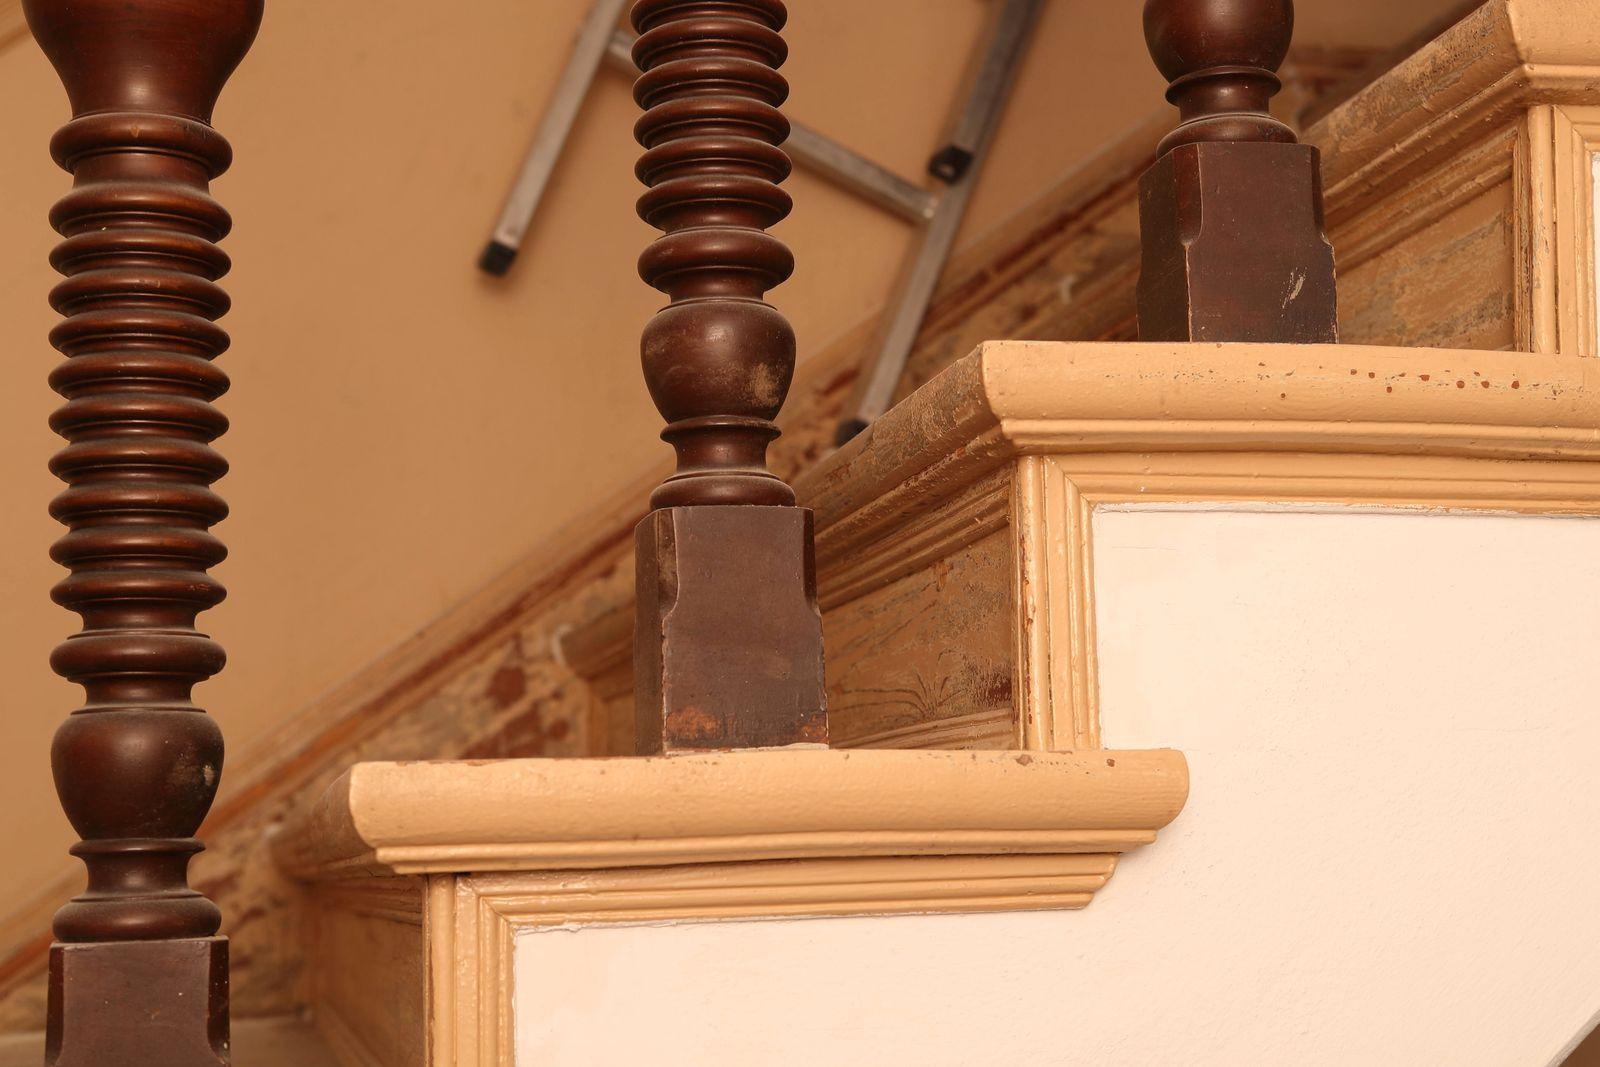 Treppenhausrenovierung GER, 20200202, Symbolbild, Treppenhausrenovierung *** Staircase renovation GER, 20200202, Symbol